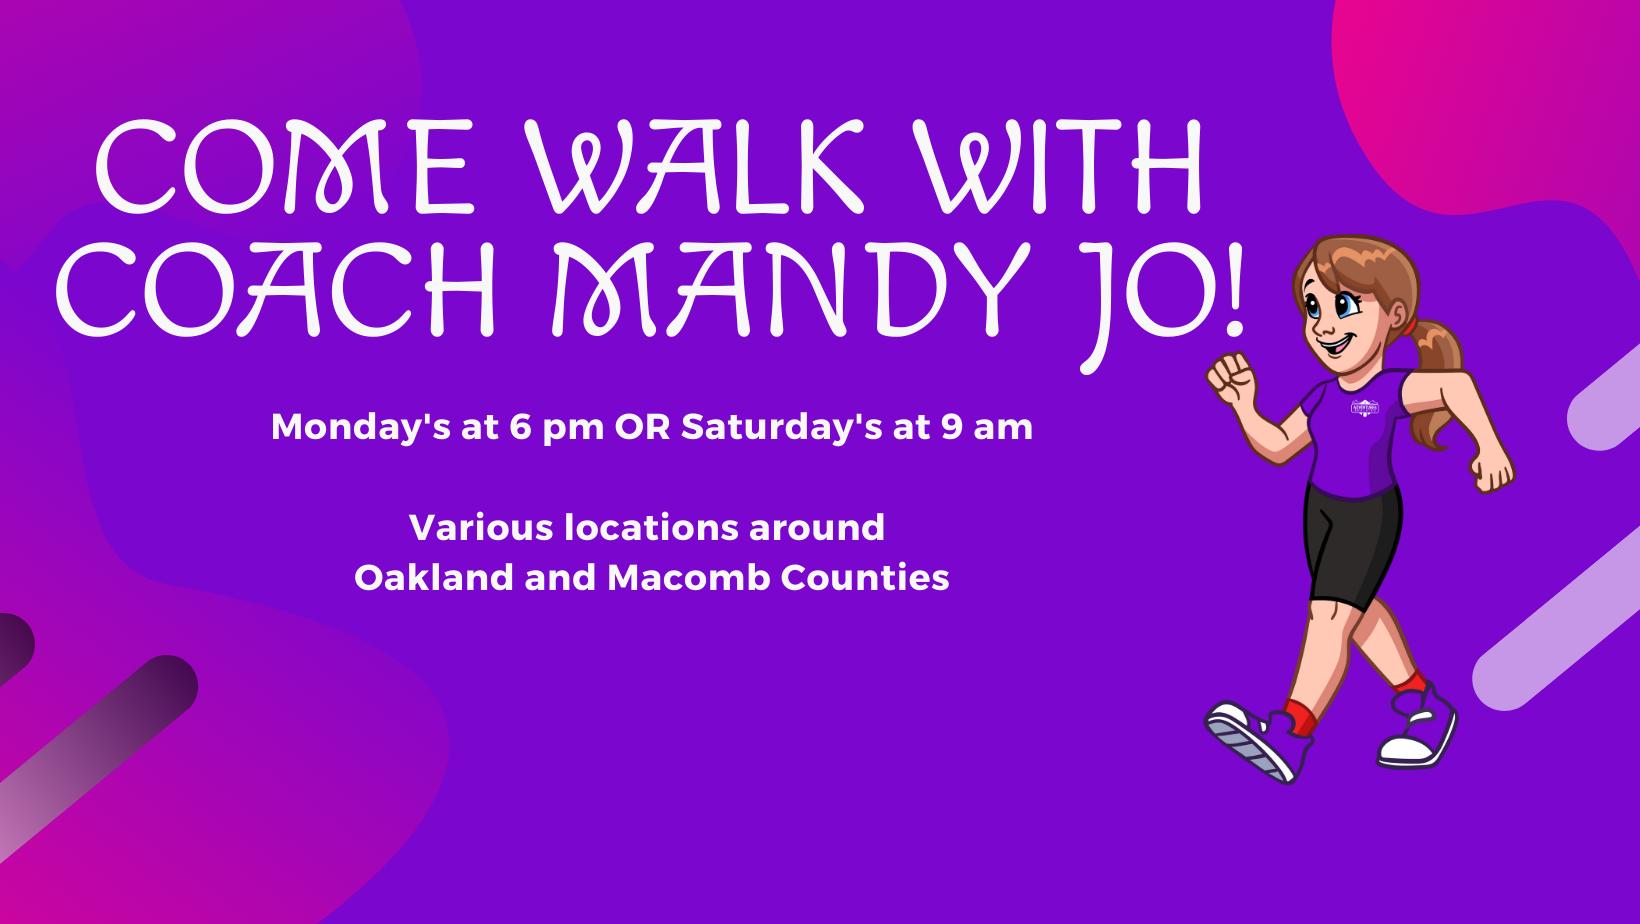 Come walk with Coach Mandy Jo - no link